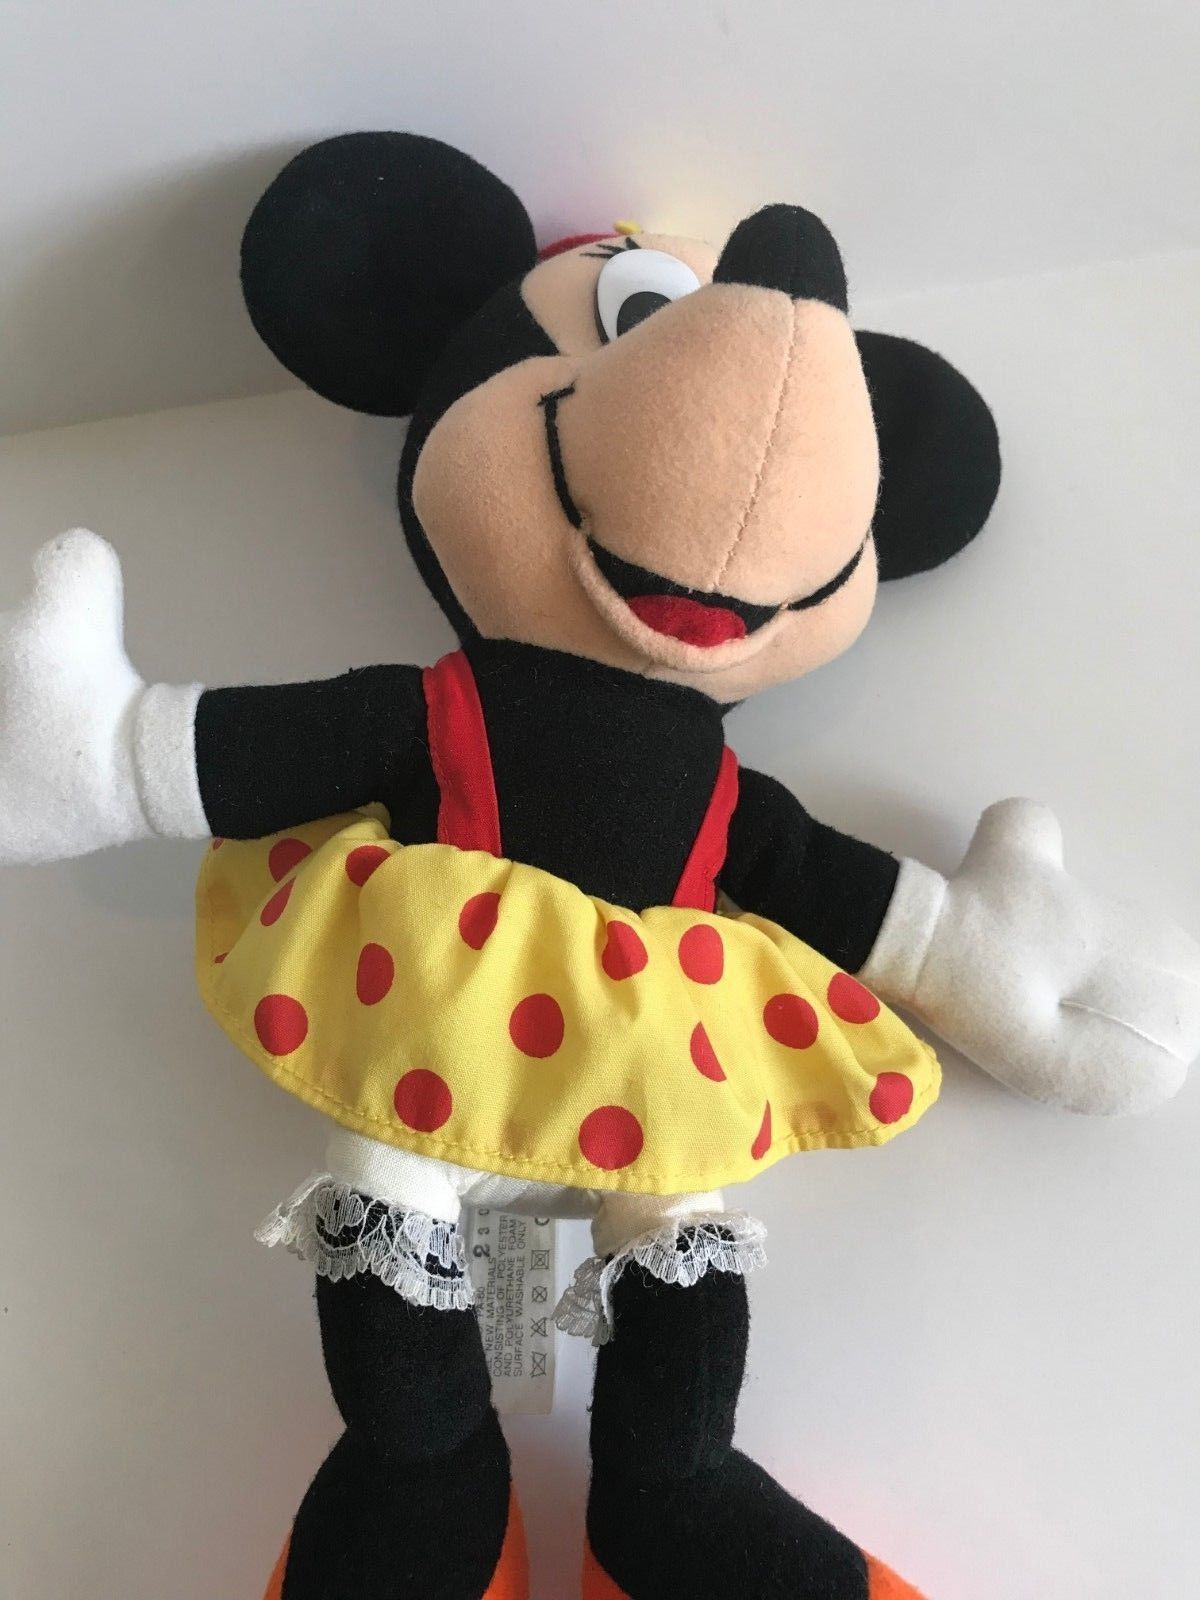 Mattel Arcotoys Minnie Mouse Yellow Red Polka Dot Flower Hat Plush Stuffed Doll image 7